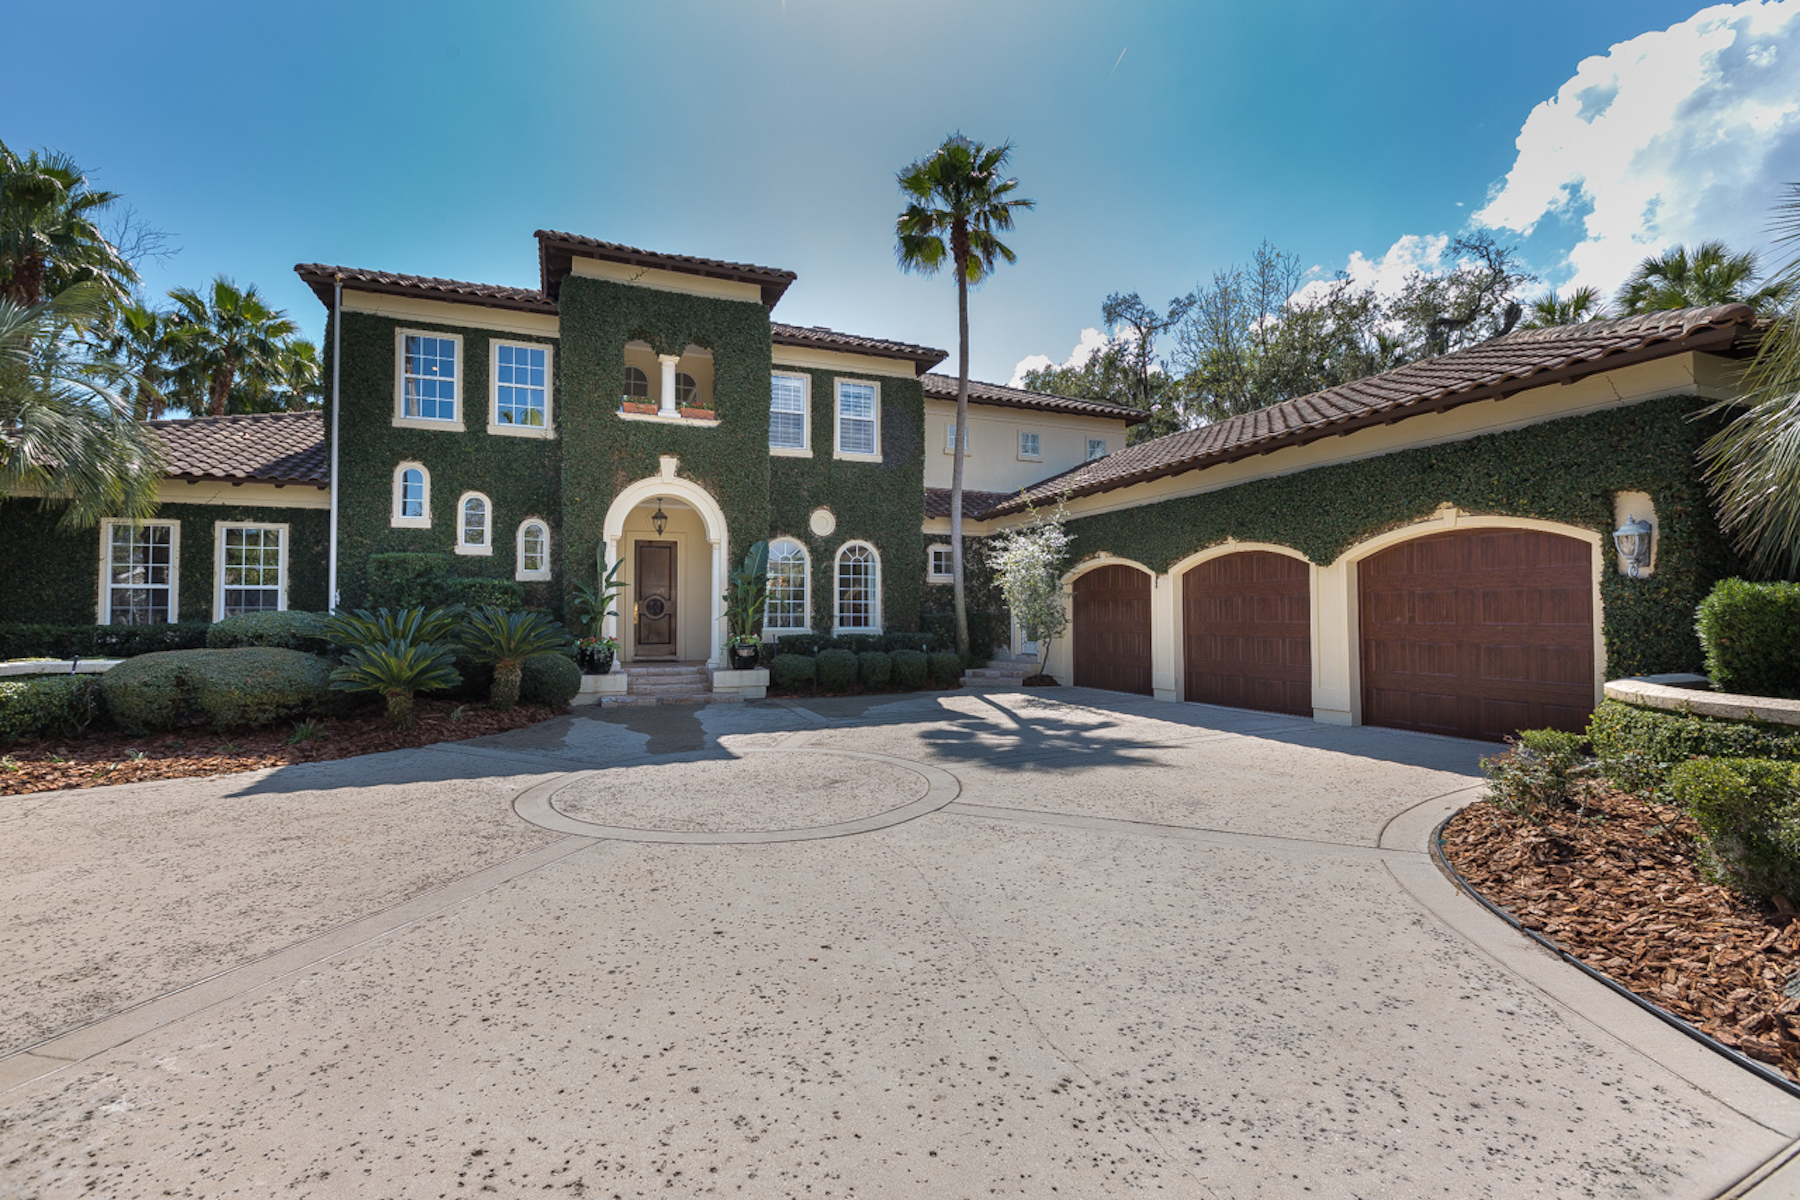 Villa per Vendita alle ore Stunning Marsh Landing Country Club Home 129 Kingfisher Drive Ponte Vedra Beach, Florida, 32082 Stati Uniti